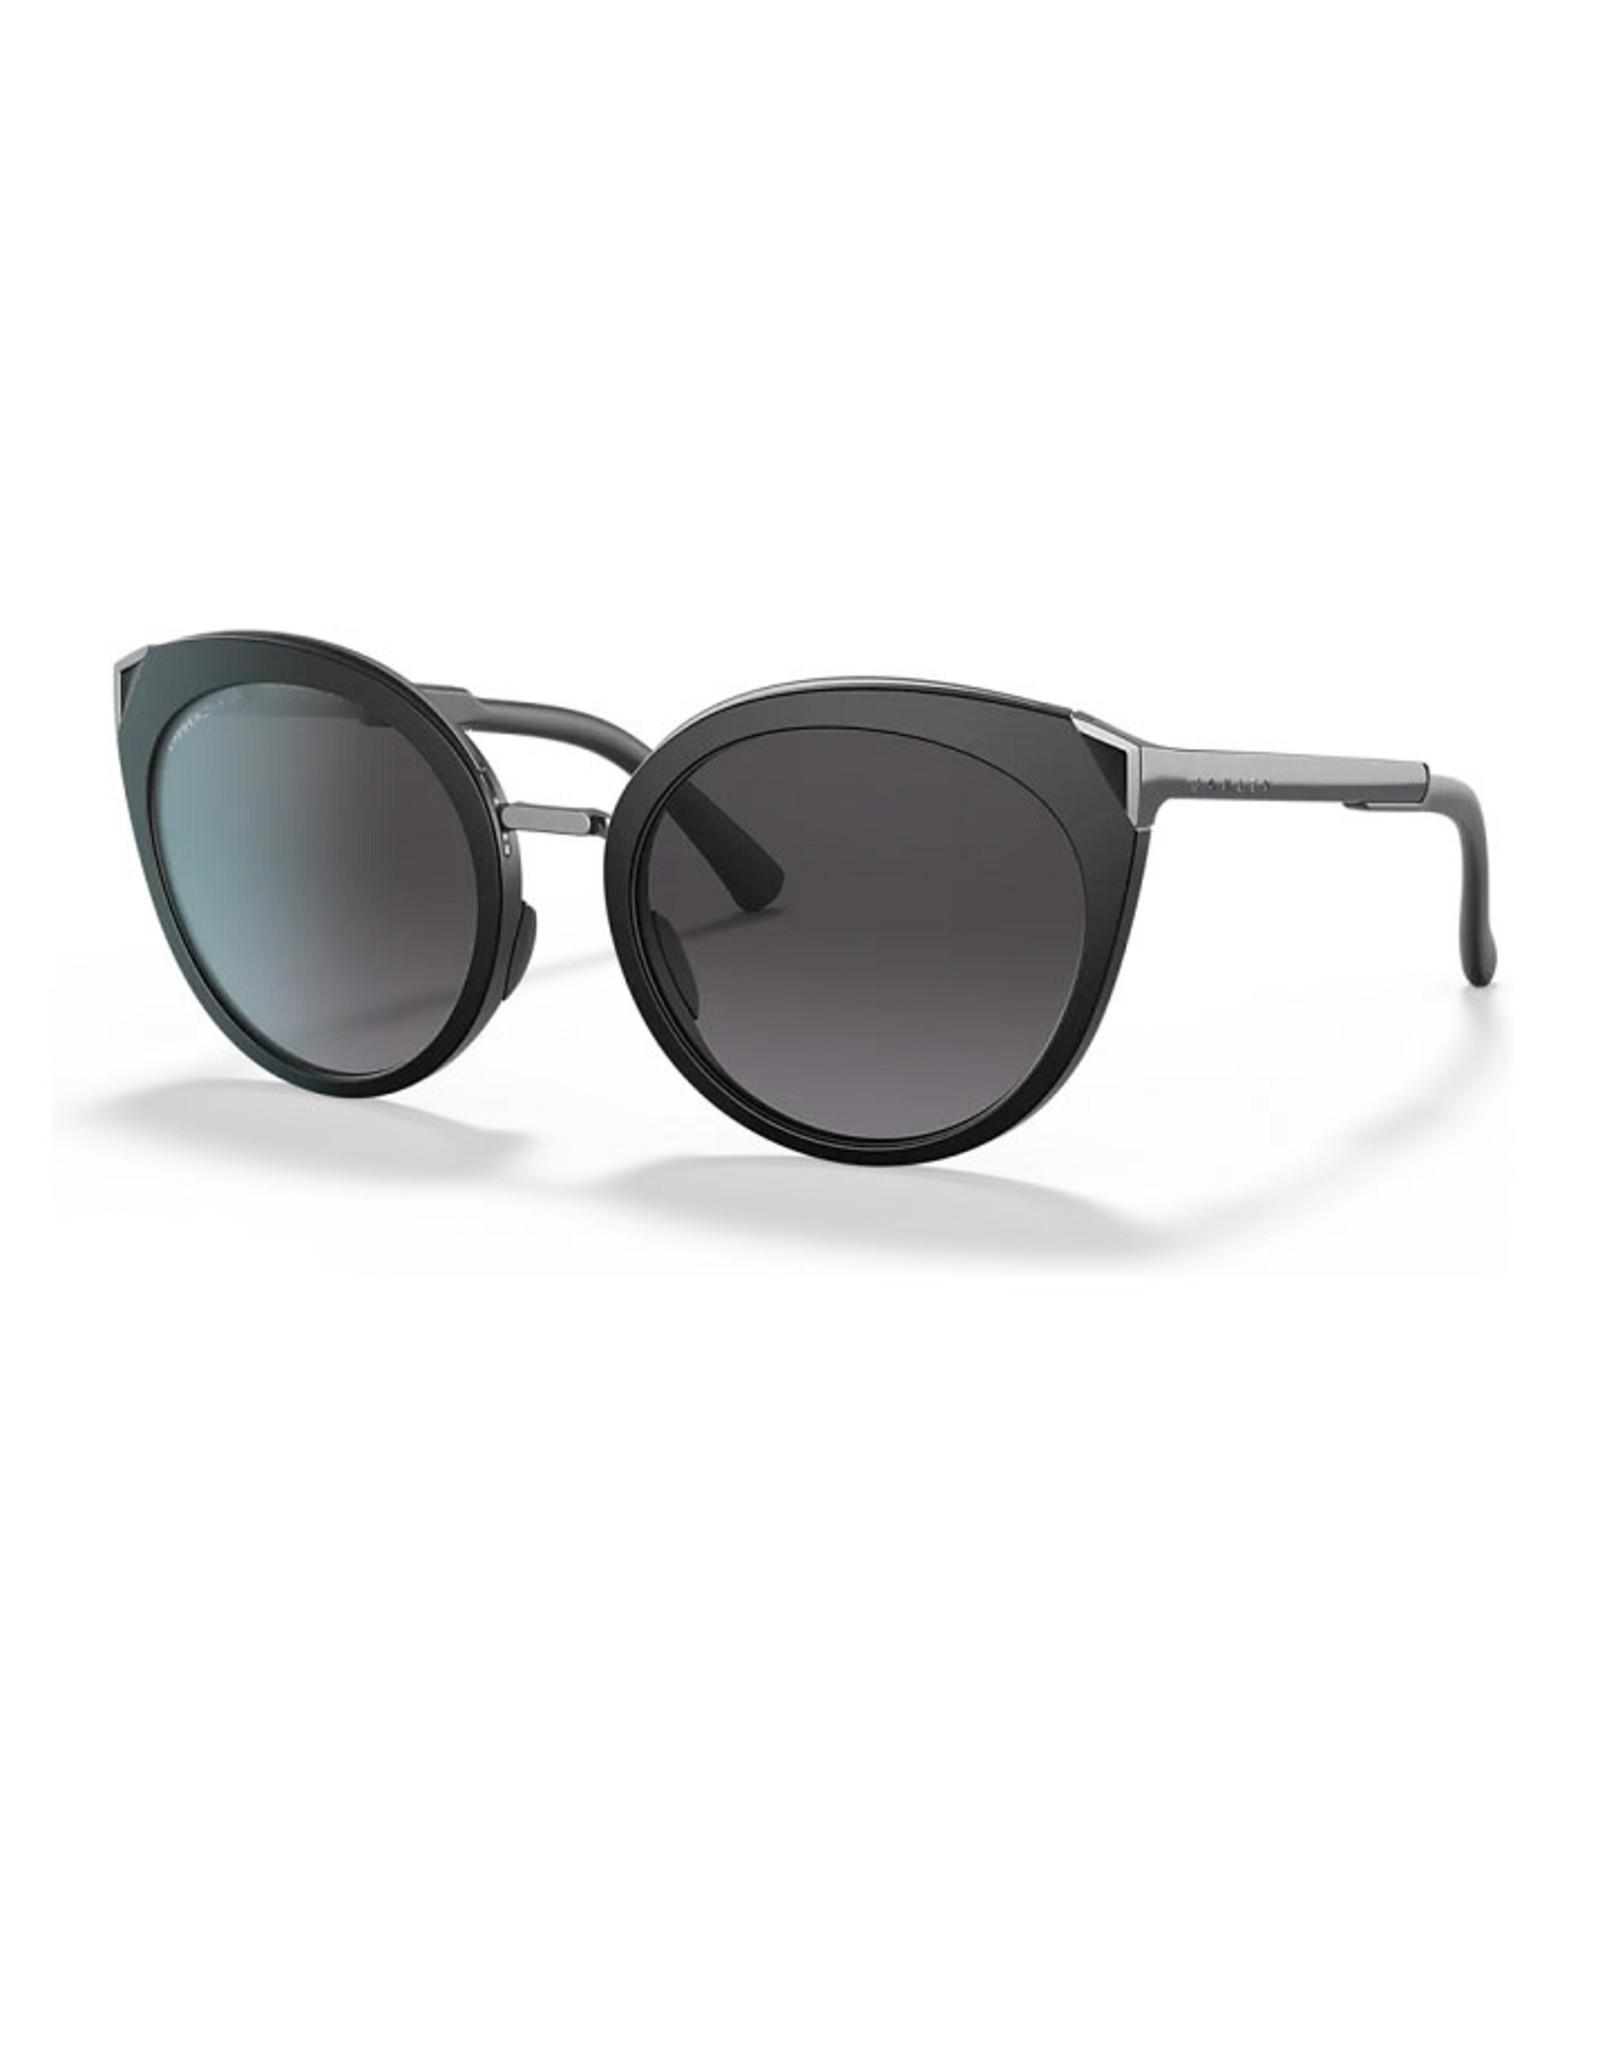 Oakley TOP KNOT Velvet Black, Prizm Grey Gradient